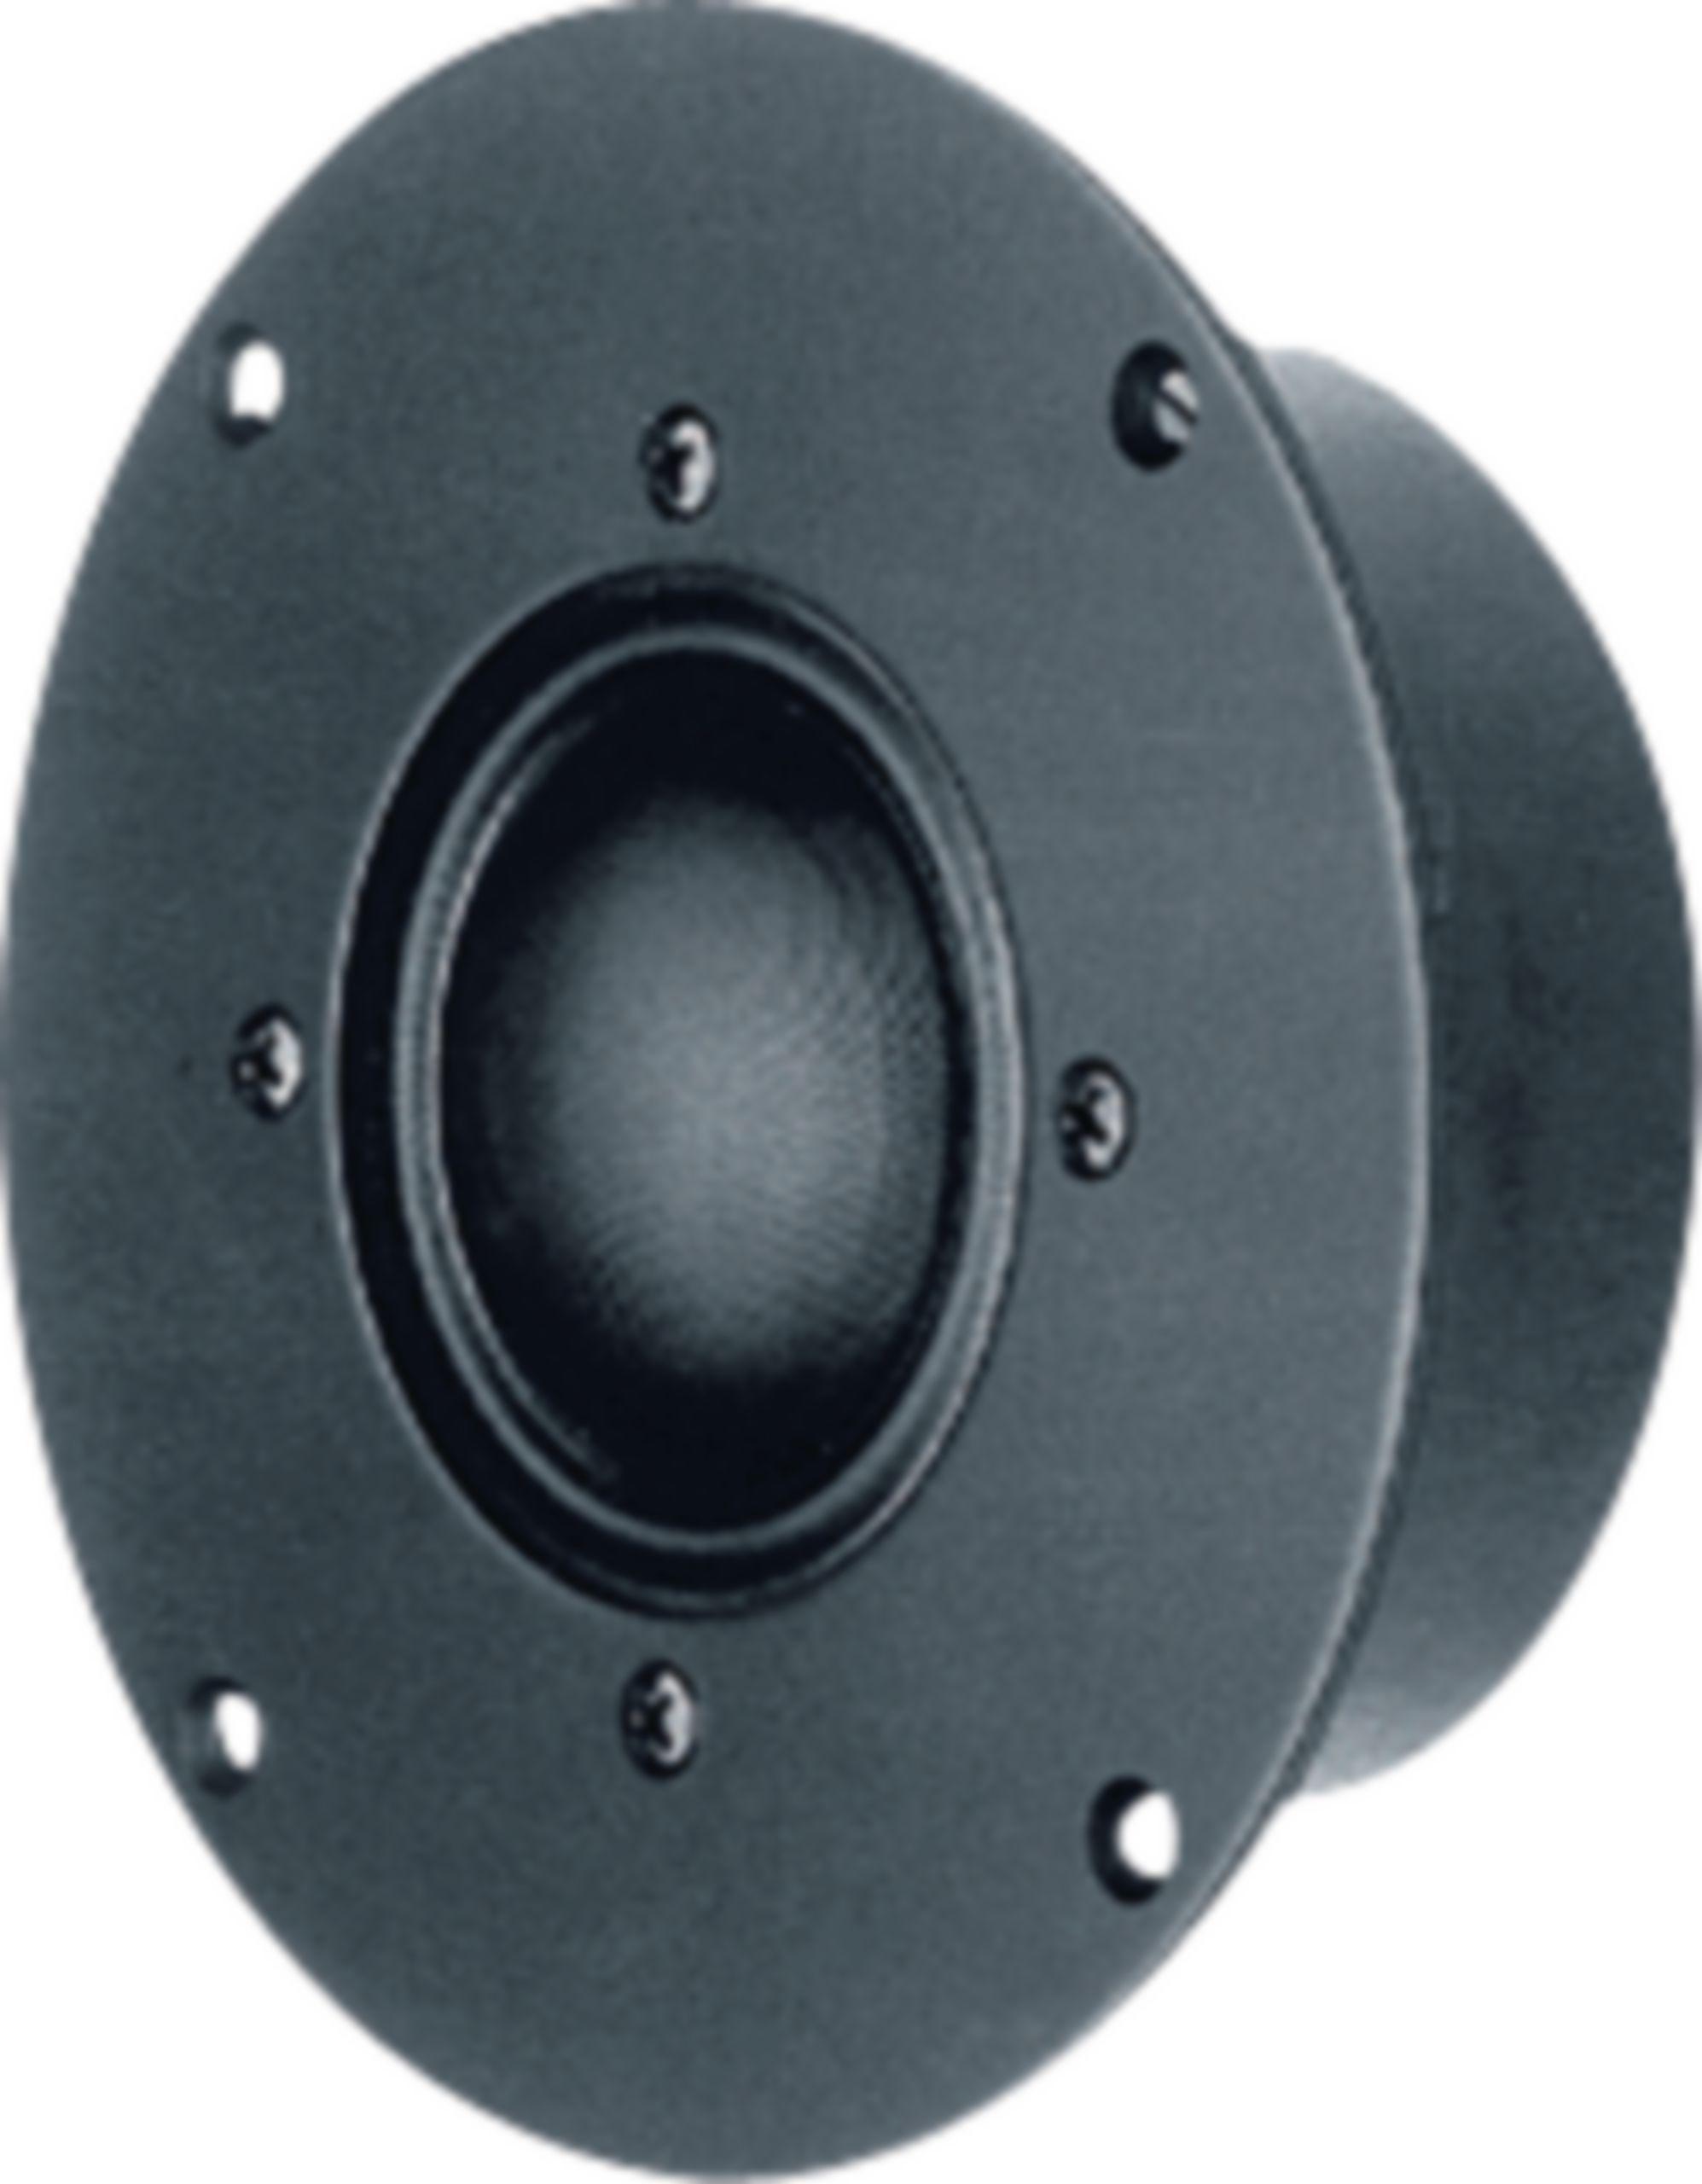 "Středotónový reproduktor 5 cm (2"") 8 Ohm 180 W Visaton, VS-G50FFL/8"